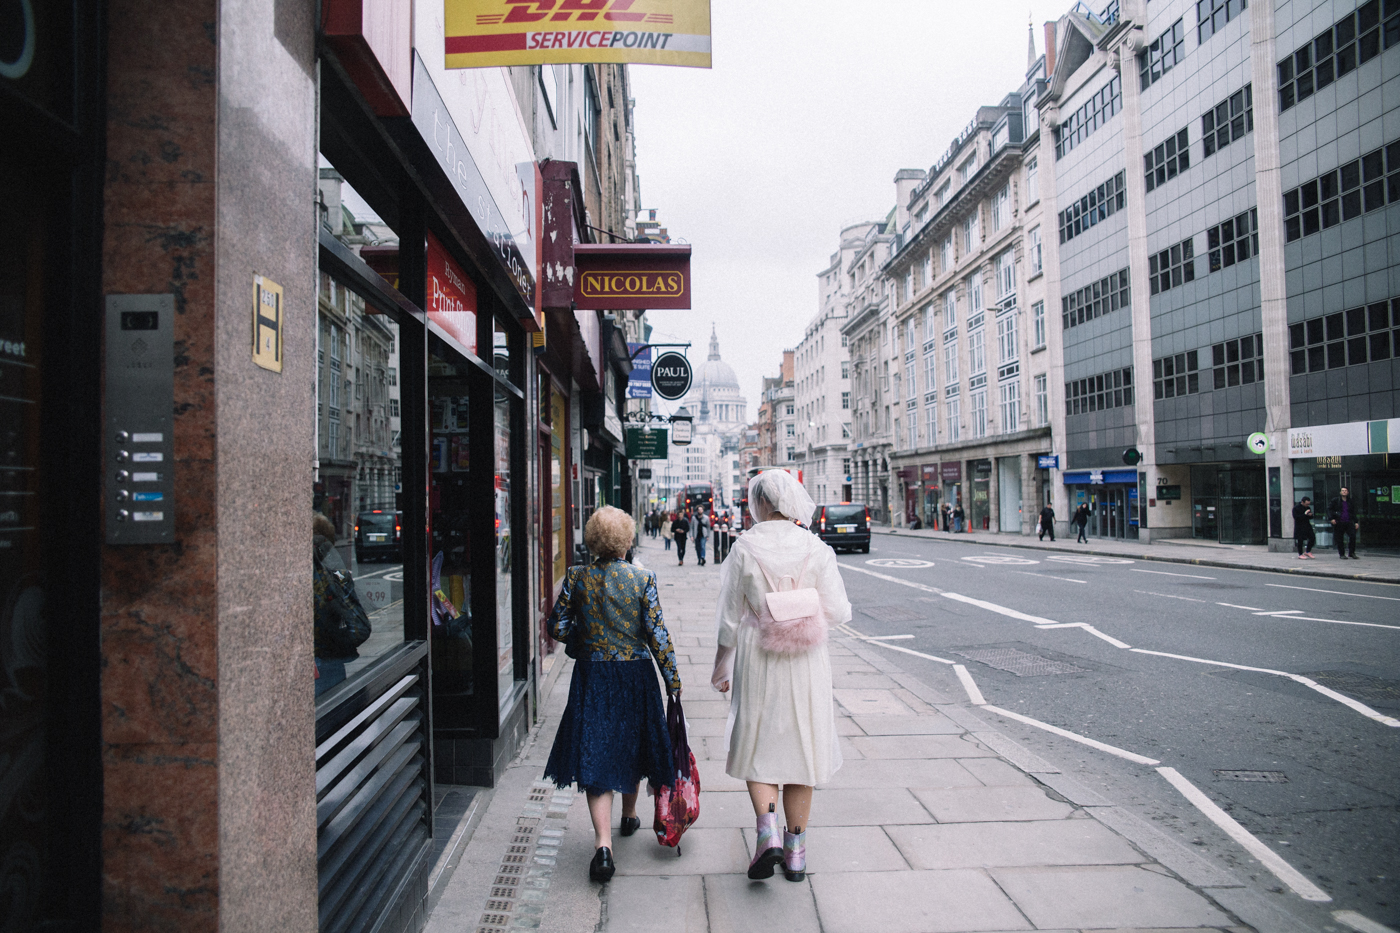 knights-templar-london-city-centre-wedding-photographer-charing-cross-creative-0013.jpg